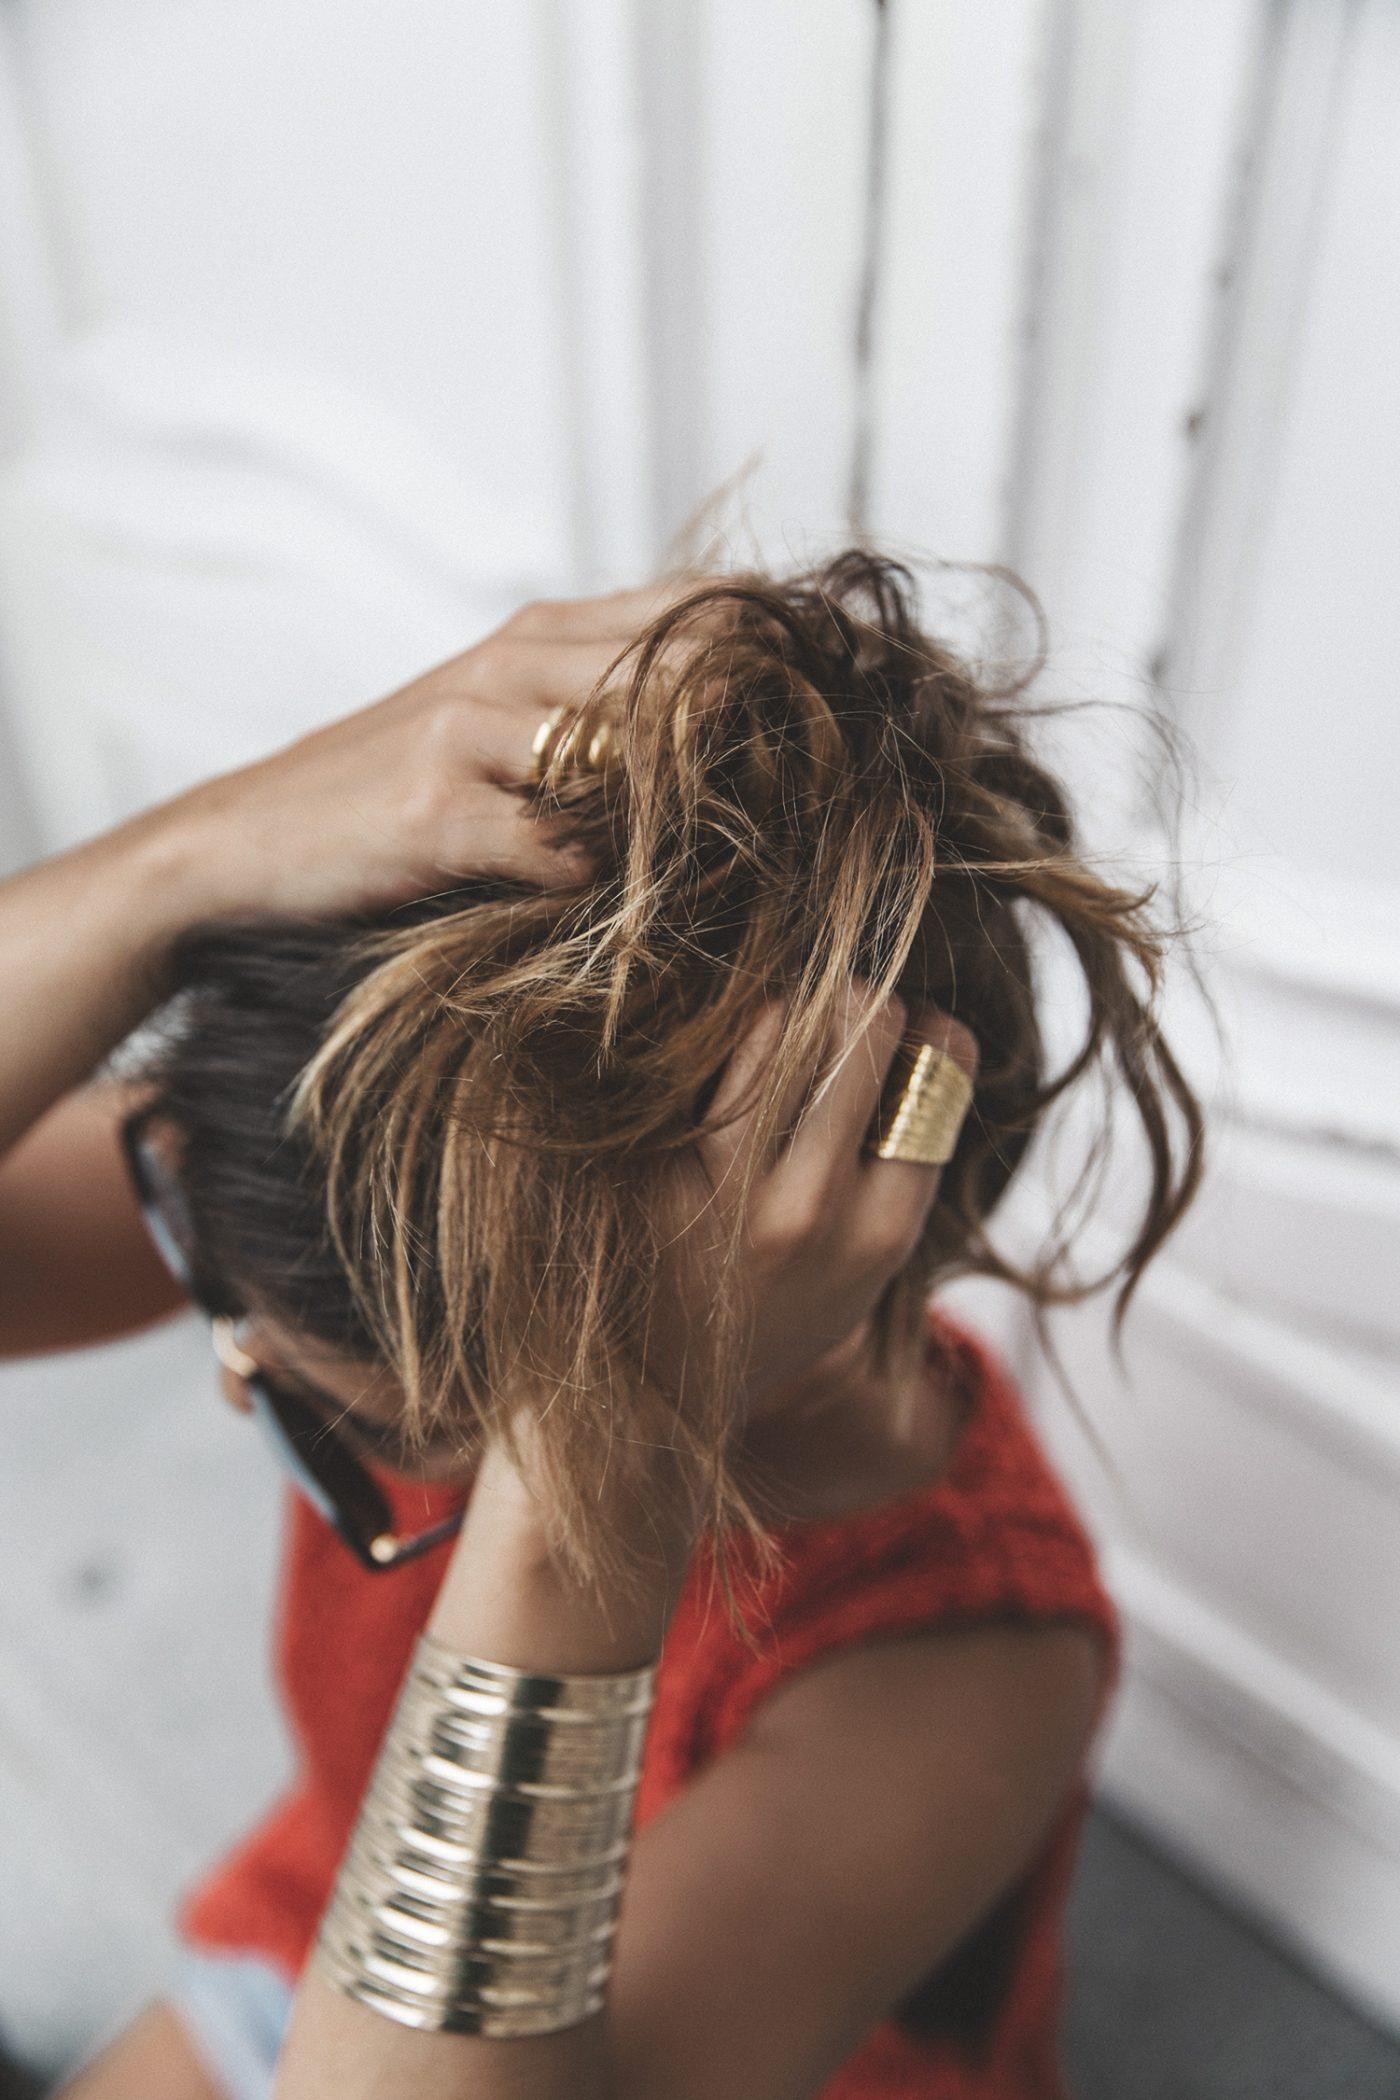 Summery_knit-Levis_Vintage_Skirt-Zalando_Espadrilles-Black_Sandals-Collage_Vintage_Horn_Necklace-Outfit-Street_Style-46